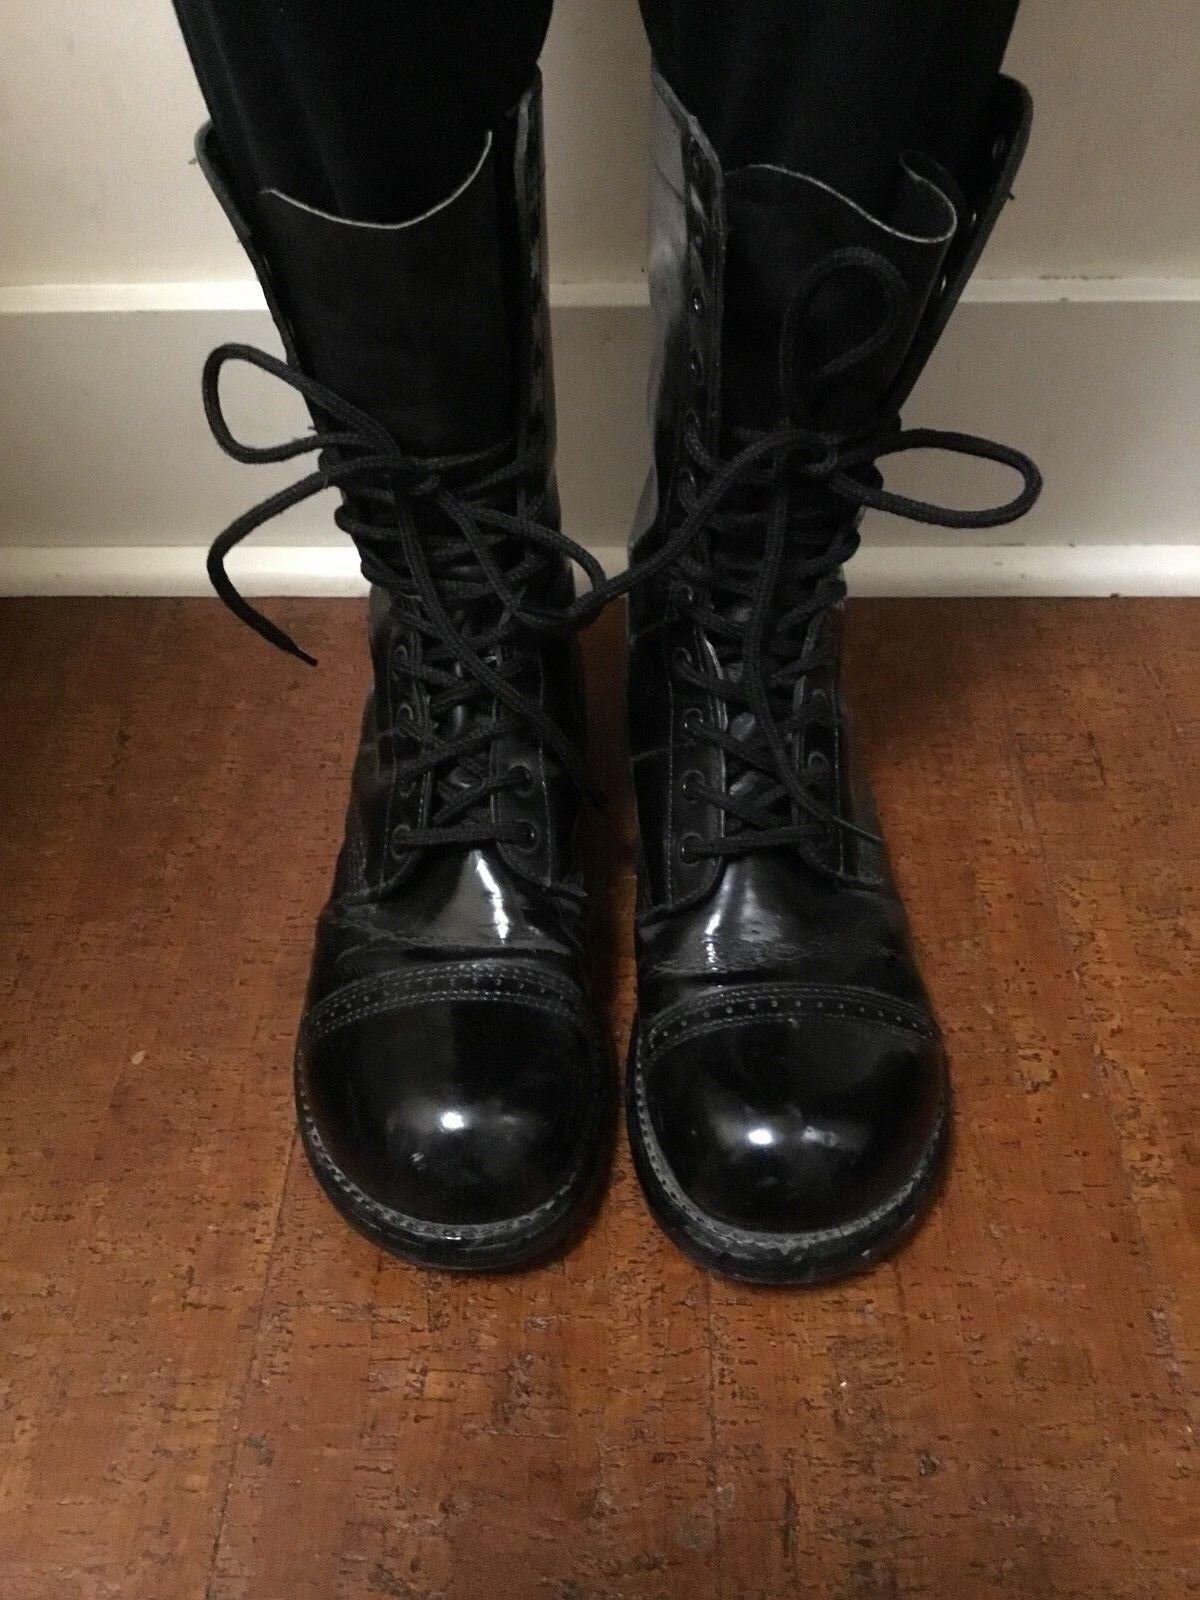 a4a9ddc7d15 CORCORAN 1500 Jump Boots Black 10 10 10 Inch 12 Eyelet - Mens 9.5E ...